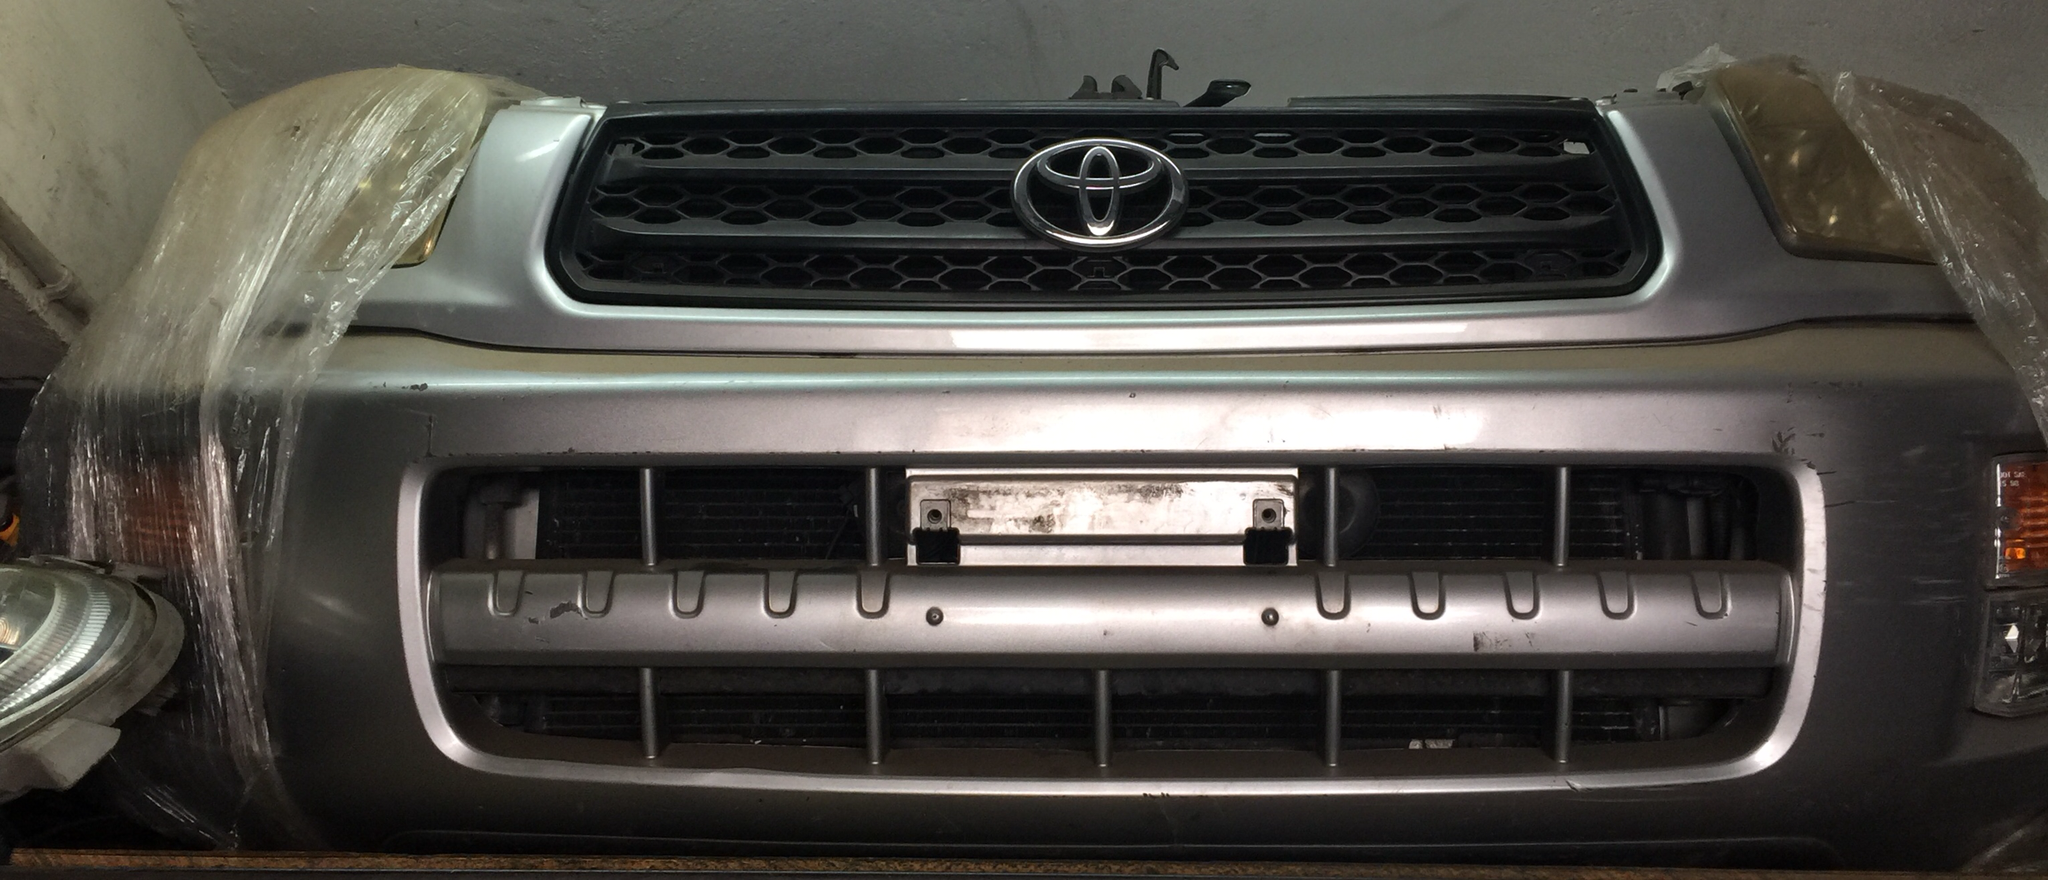 Toyota Rah4 ACA21 nose cut 00613RL